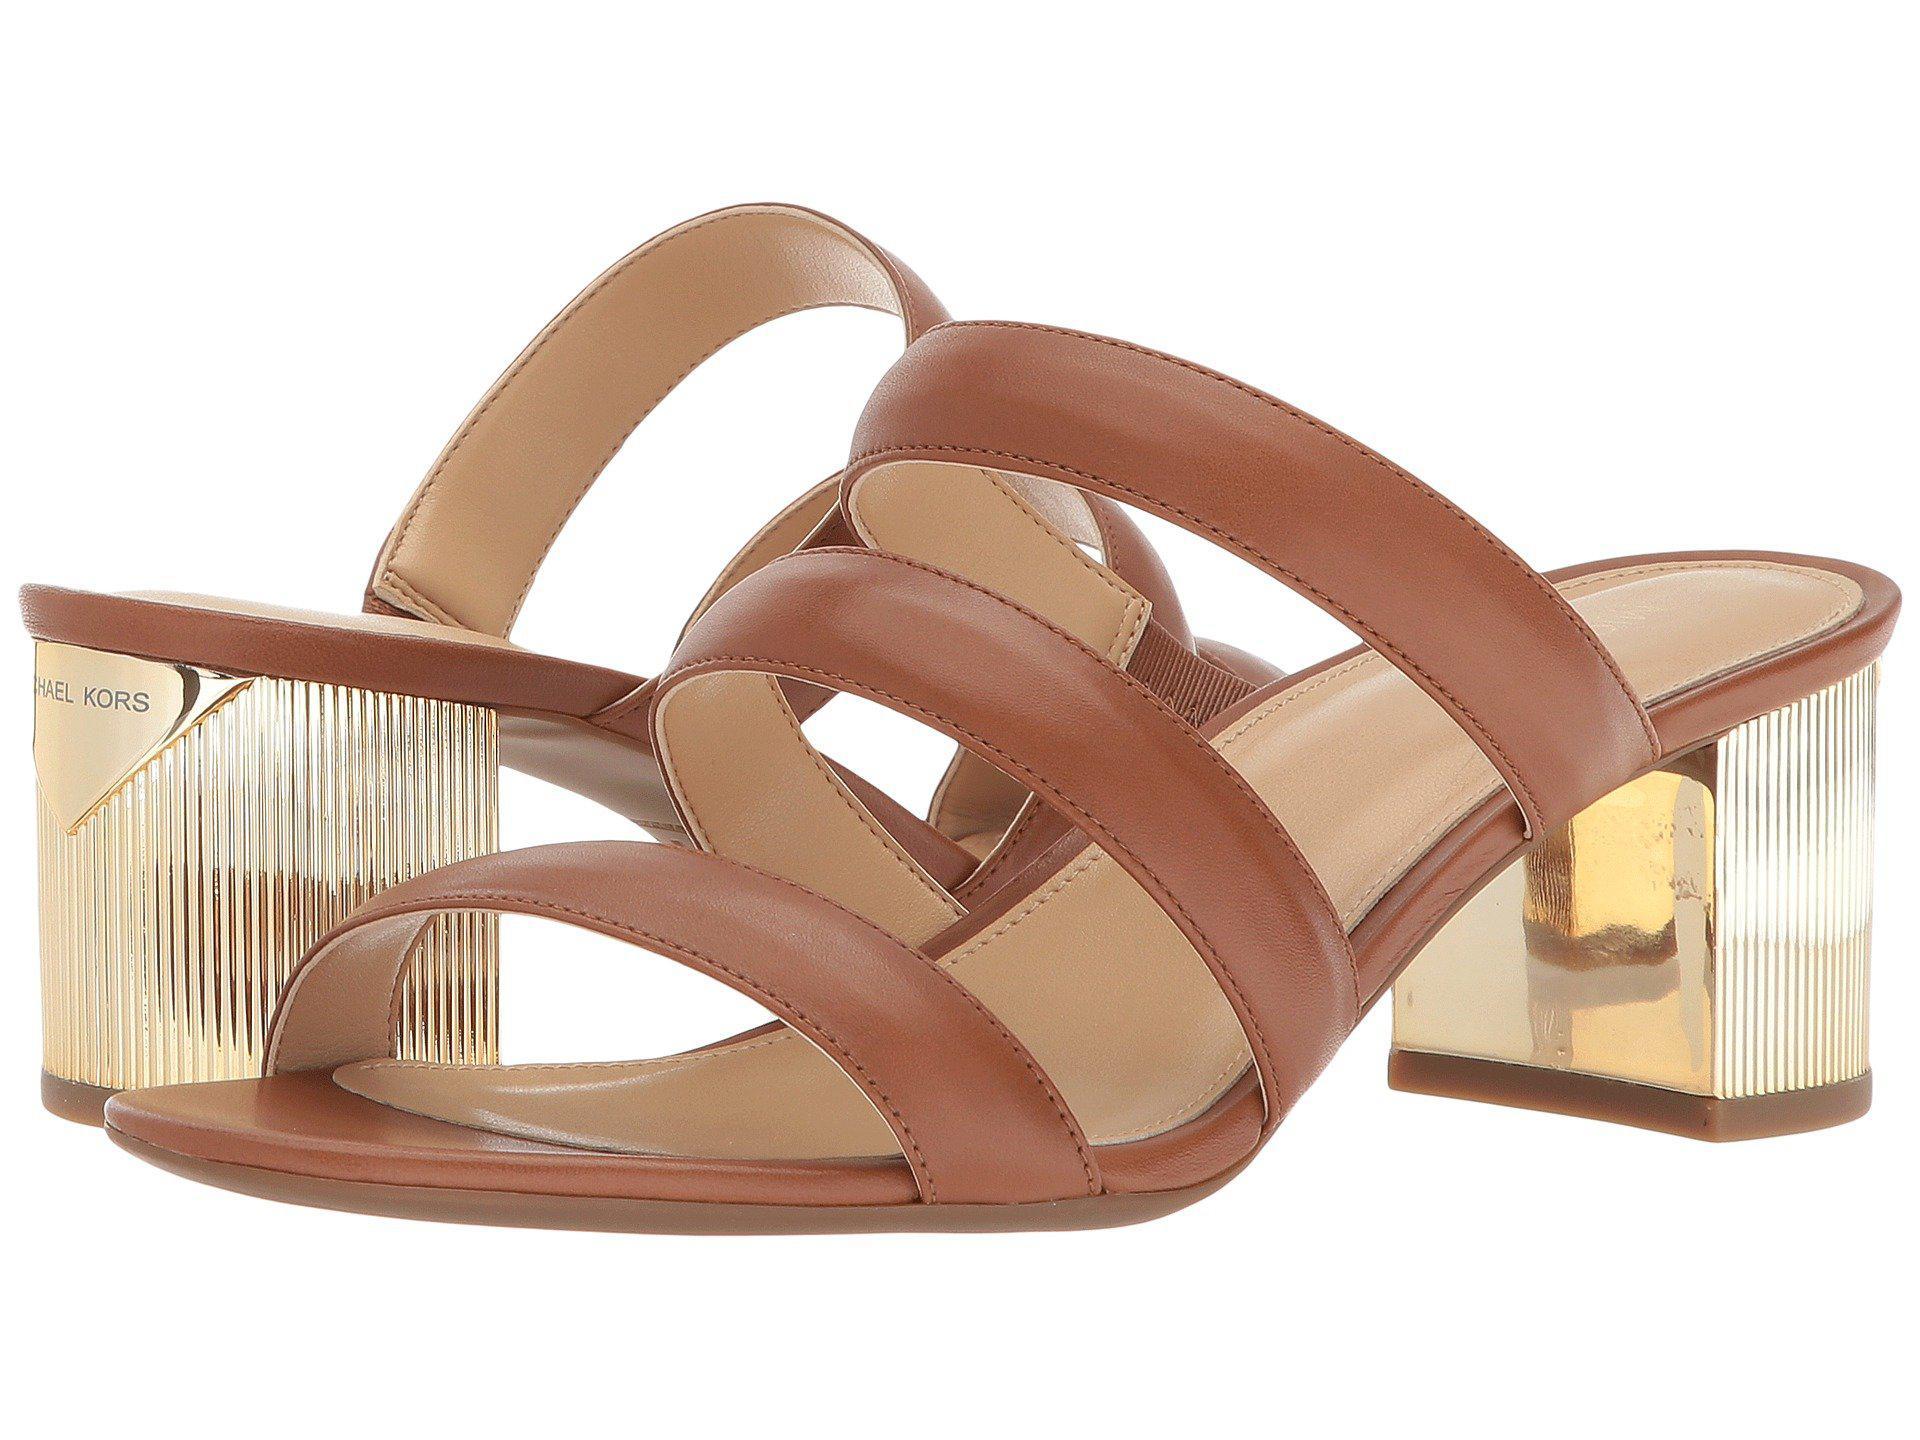 MICHAEL Michael Kors Paloma Flex Cracked Metallic Leather Sandal eCnMu5cM